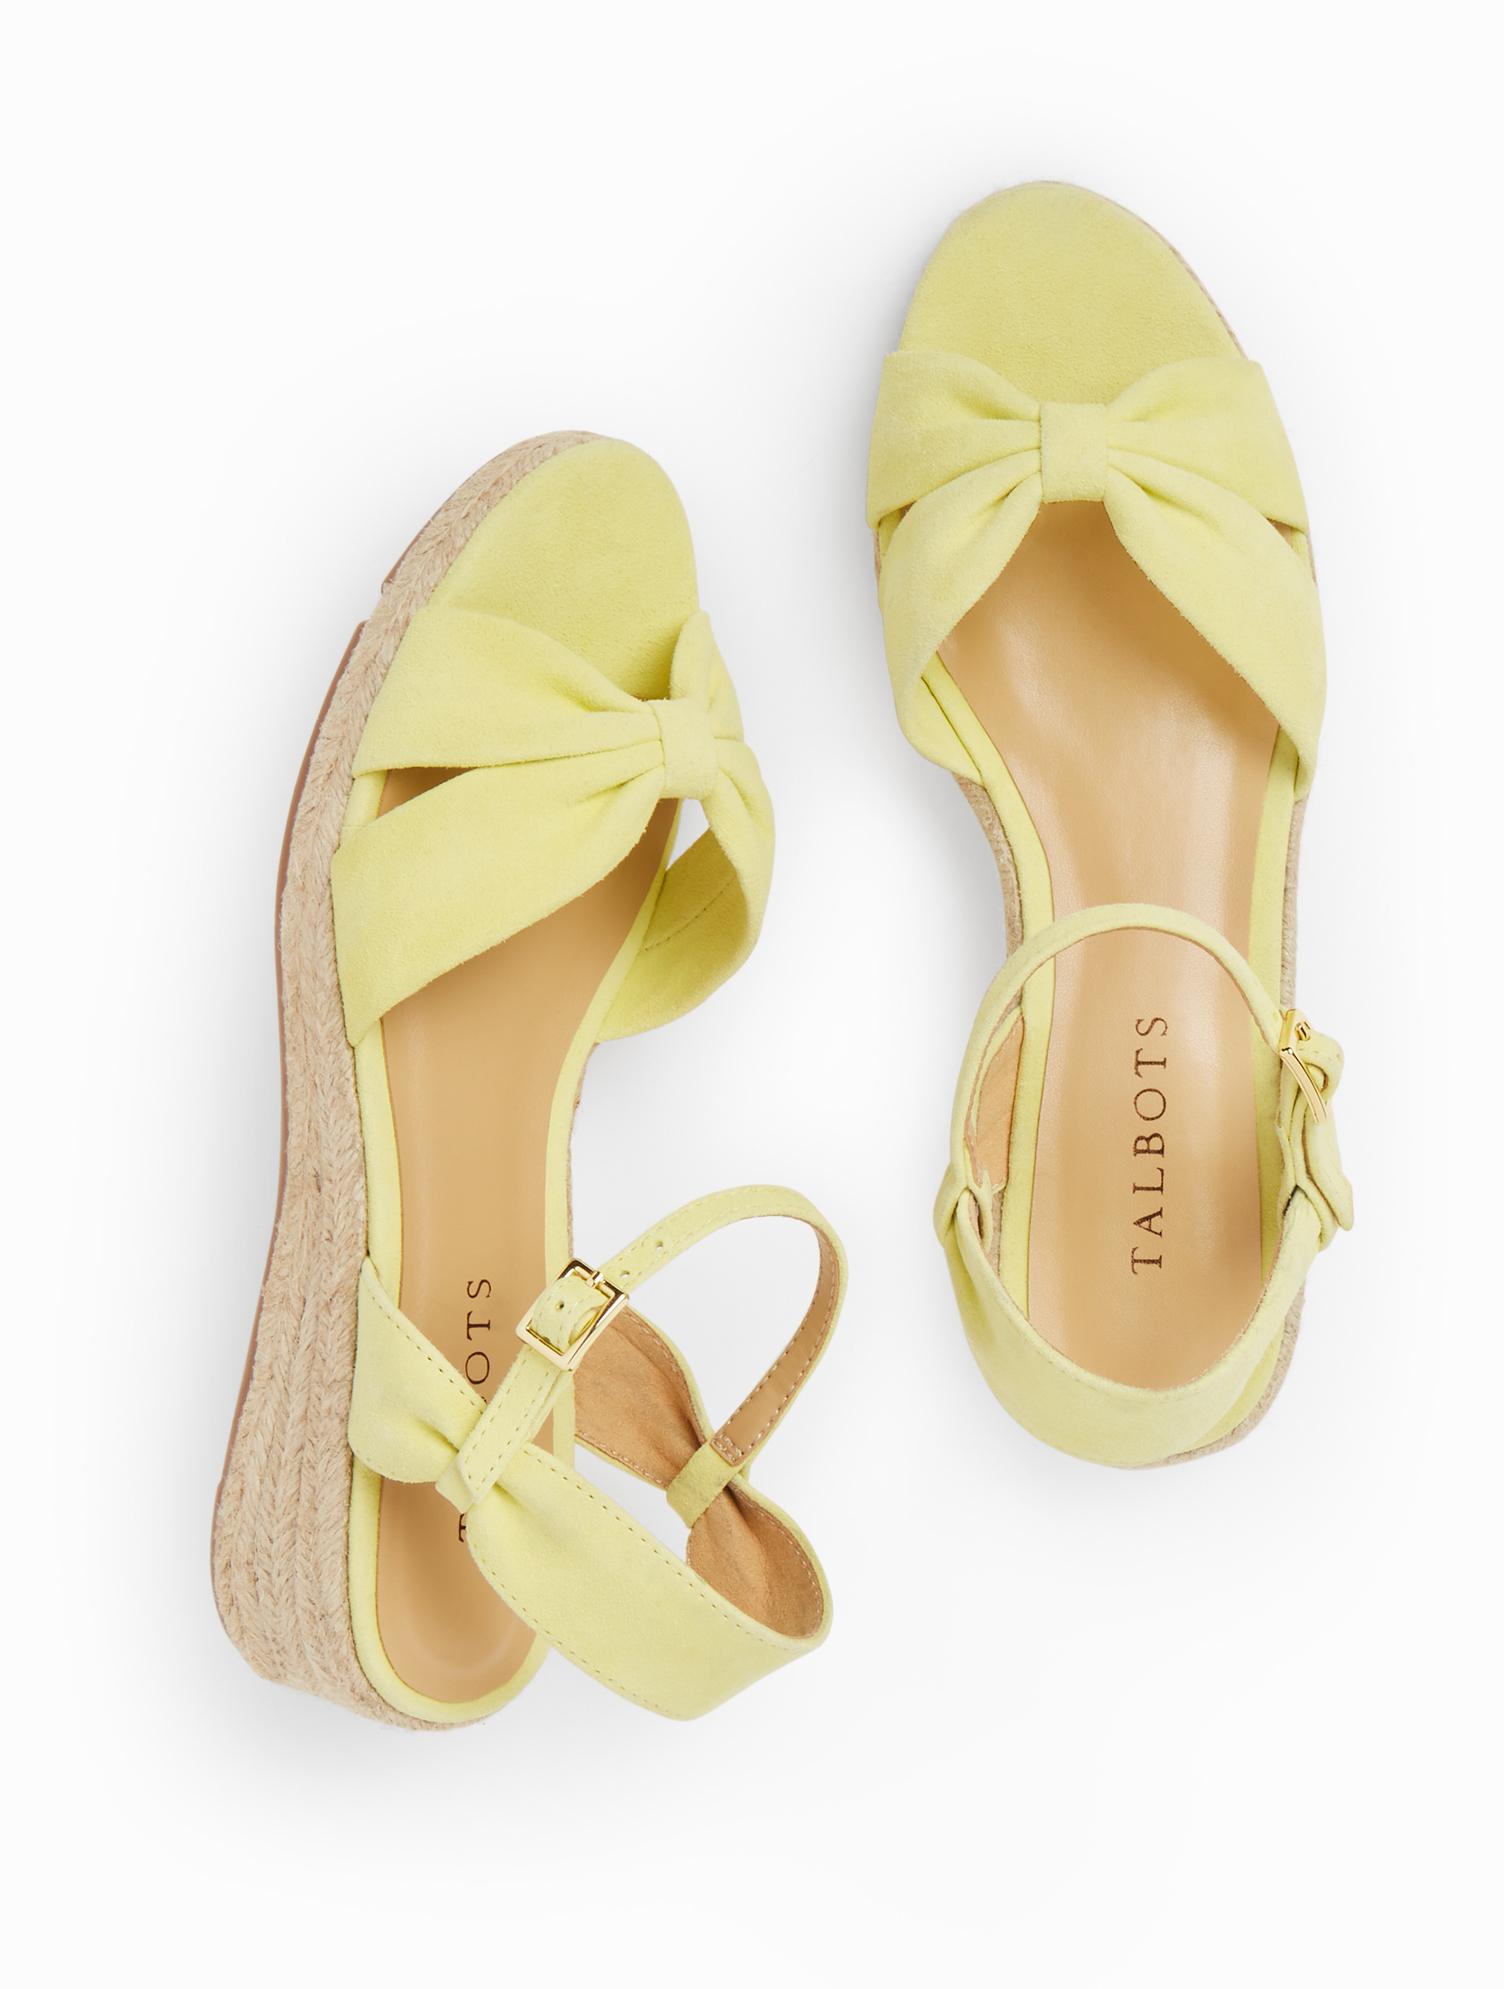 1950s Style Shoes | Heels, Flats, Boots Pamela Twist Espadrille Wedges - Kid Suede - Citrus Honey - 11M Talbots $119.00 AT vintagedancer.com